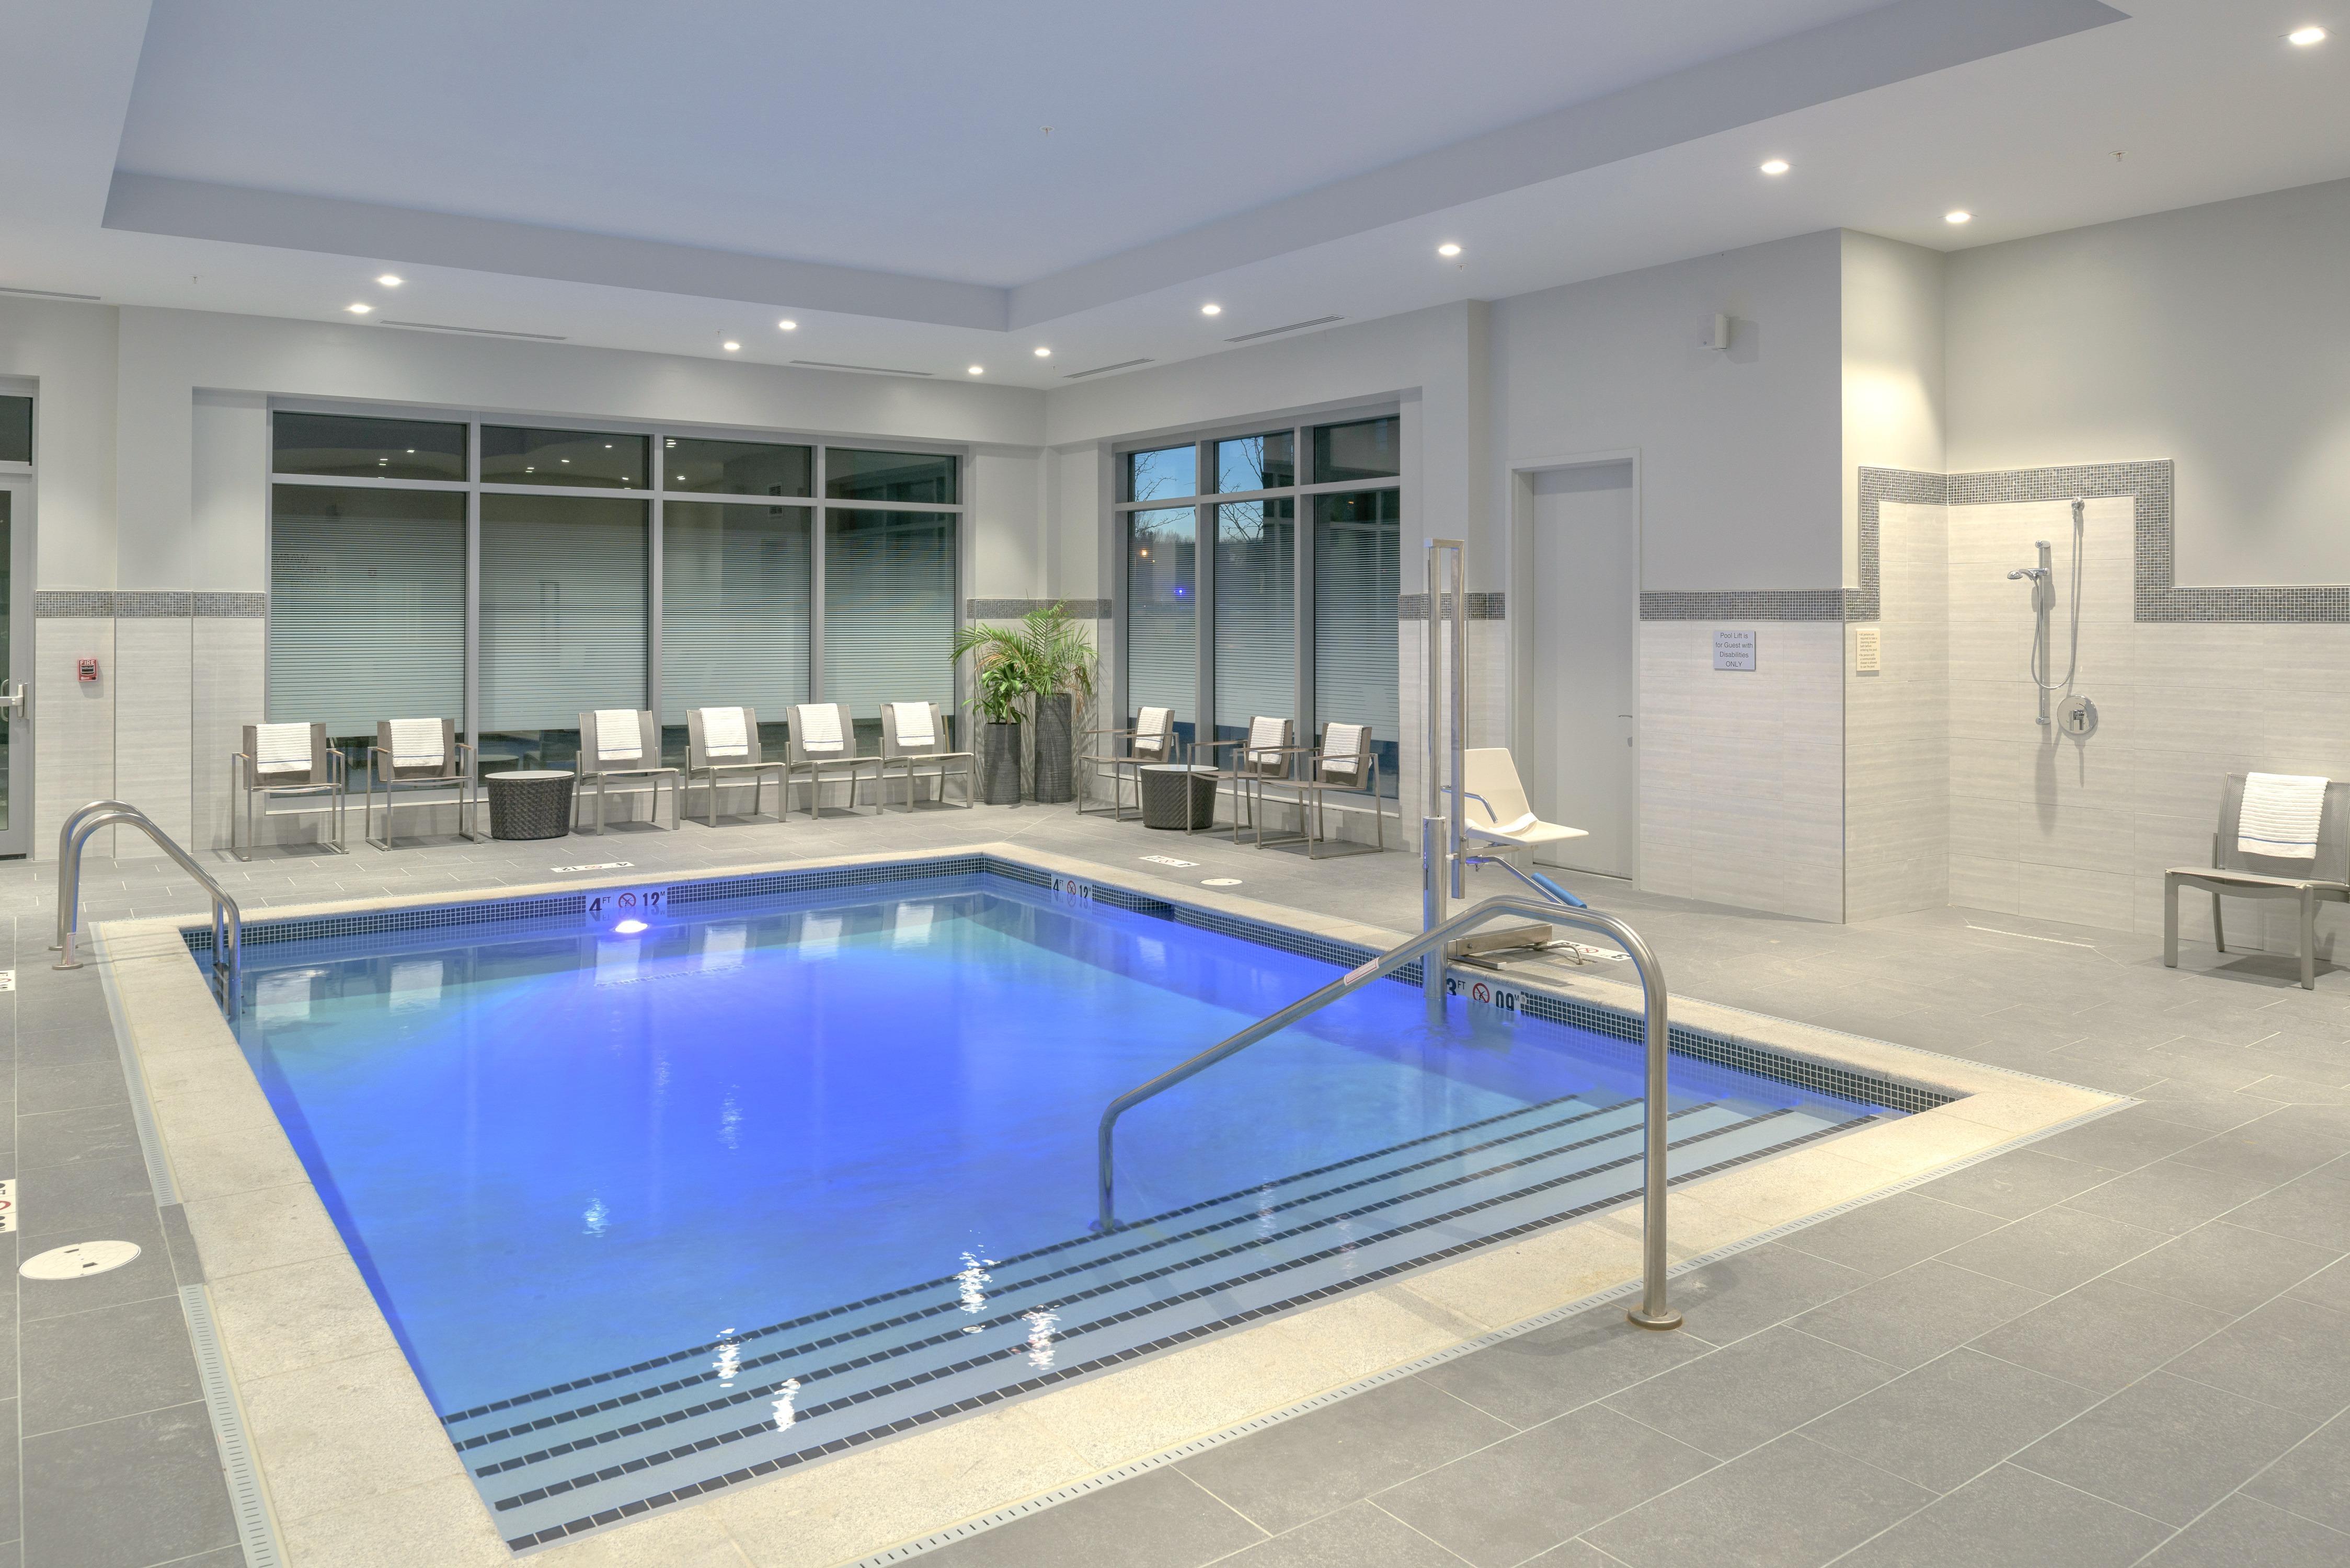 Hampton Inn Amp Suites Worcester In Worcester Ma 508 886 9005